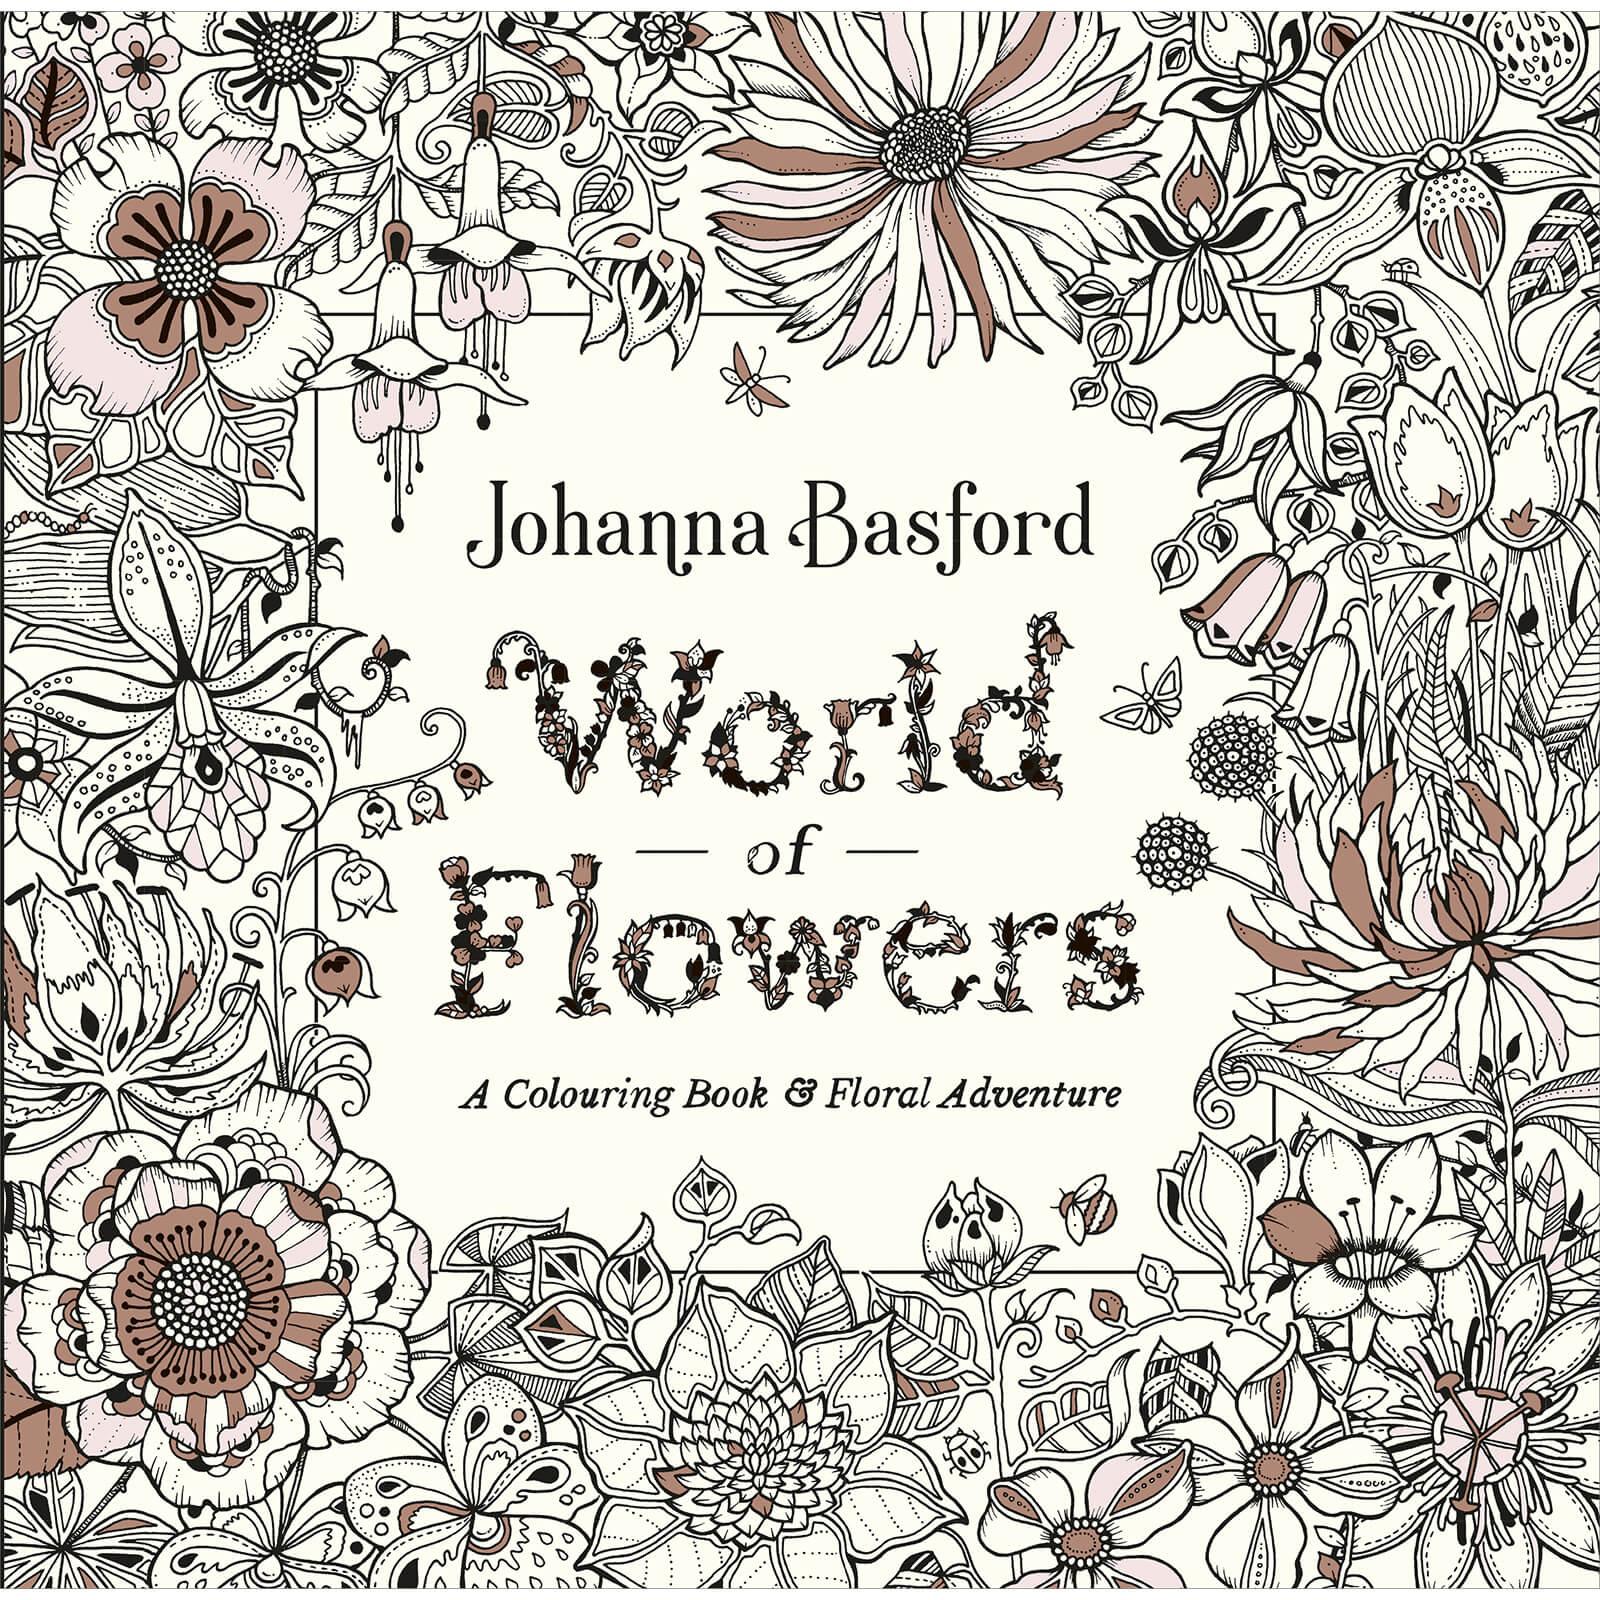 World of Flowers by Johanna Basford (Paperback)